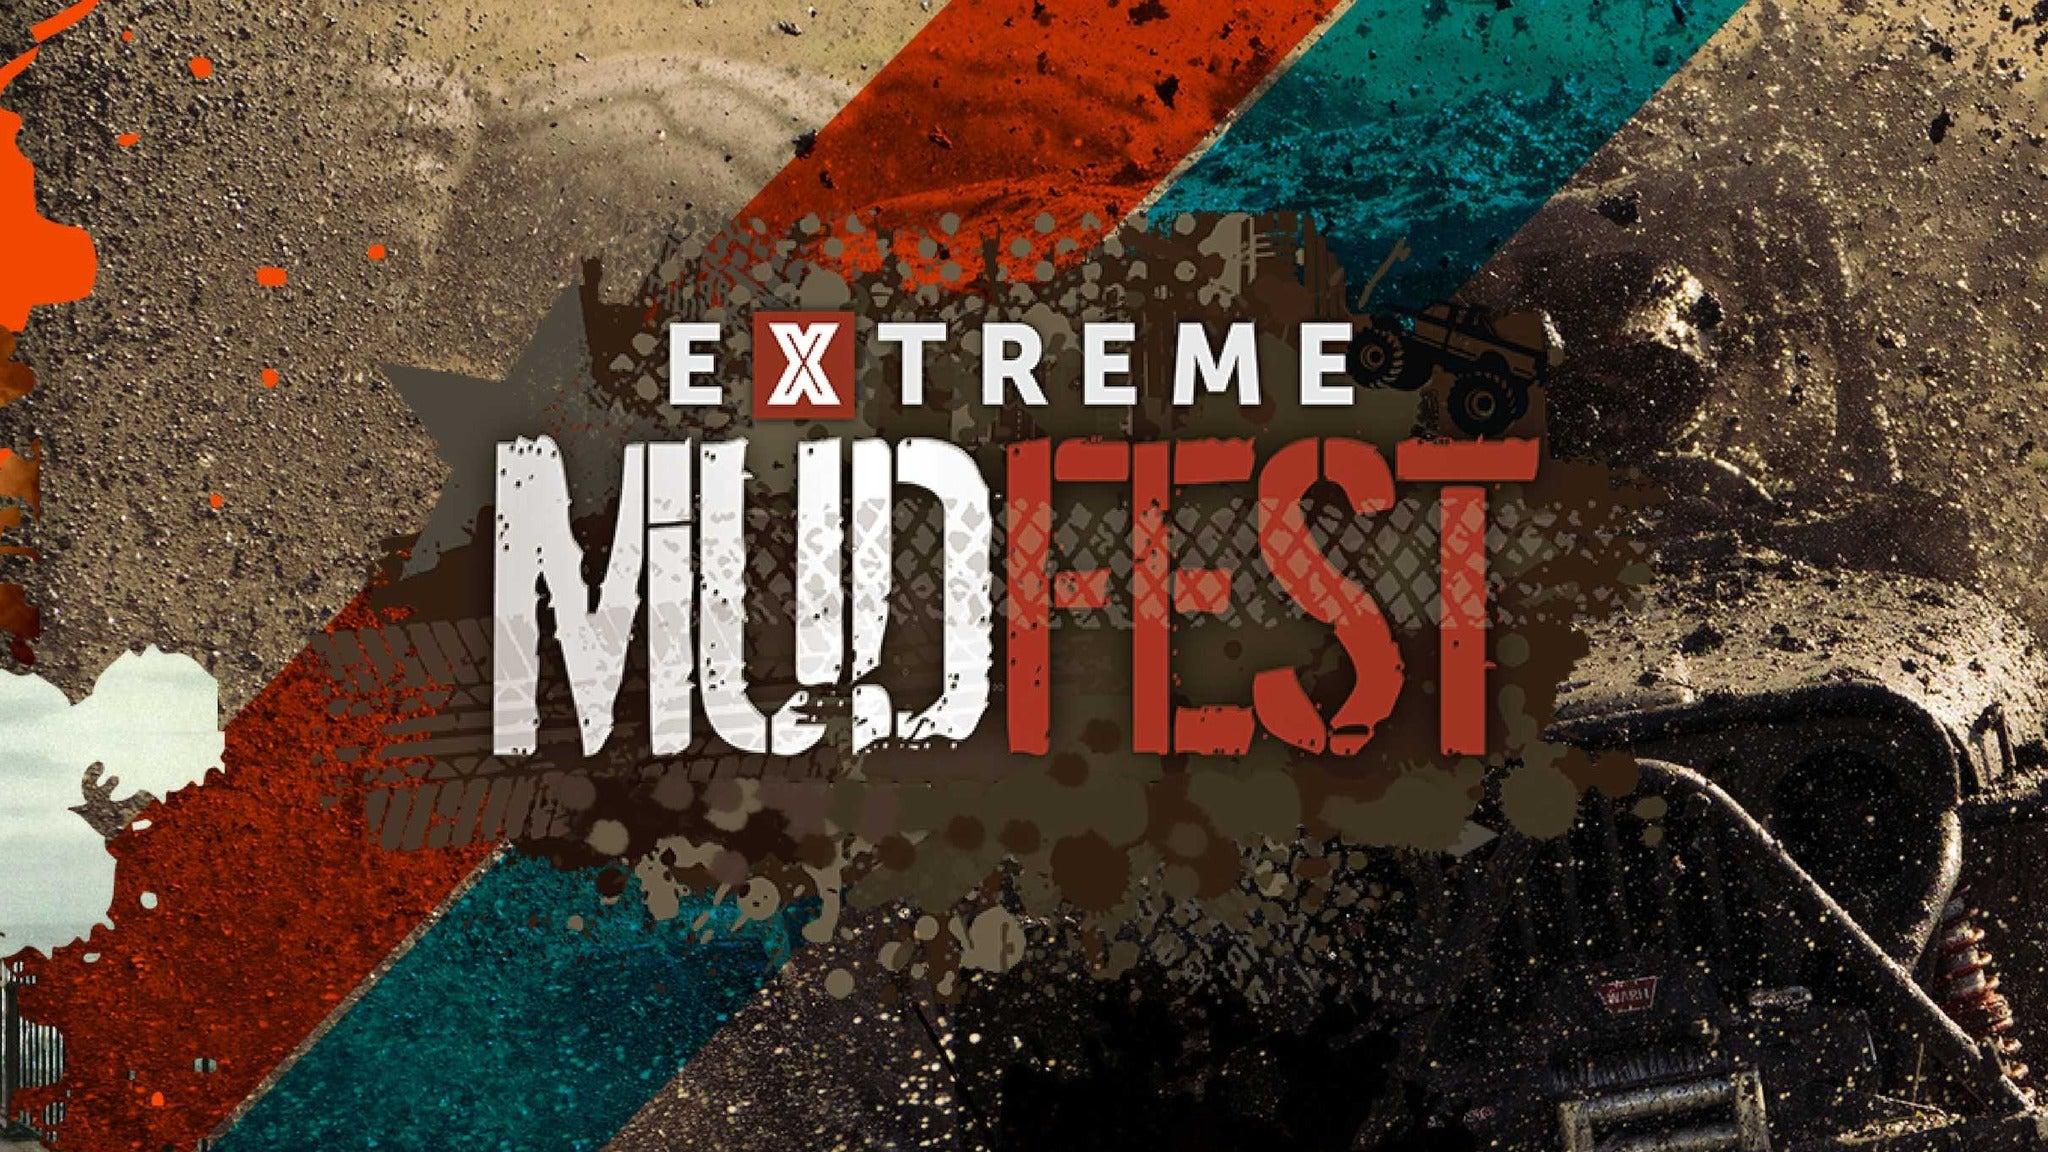 Extreme Mudfest